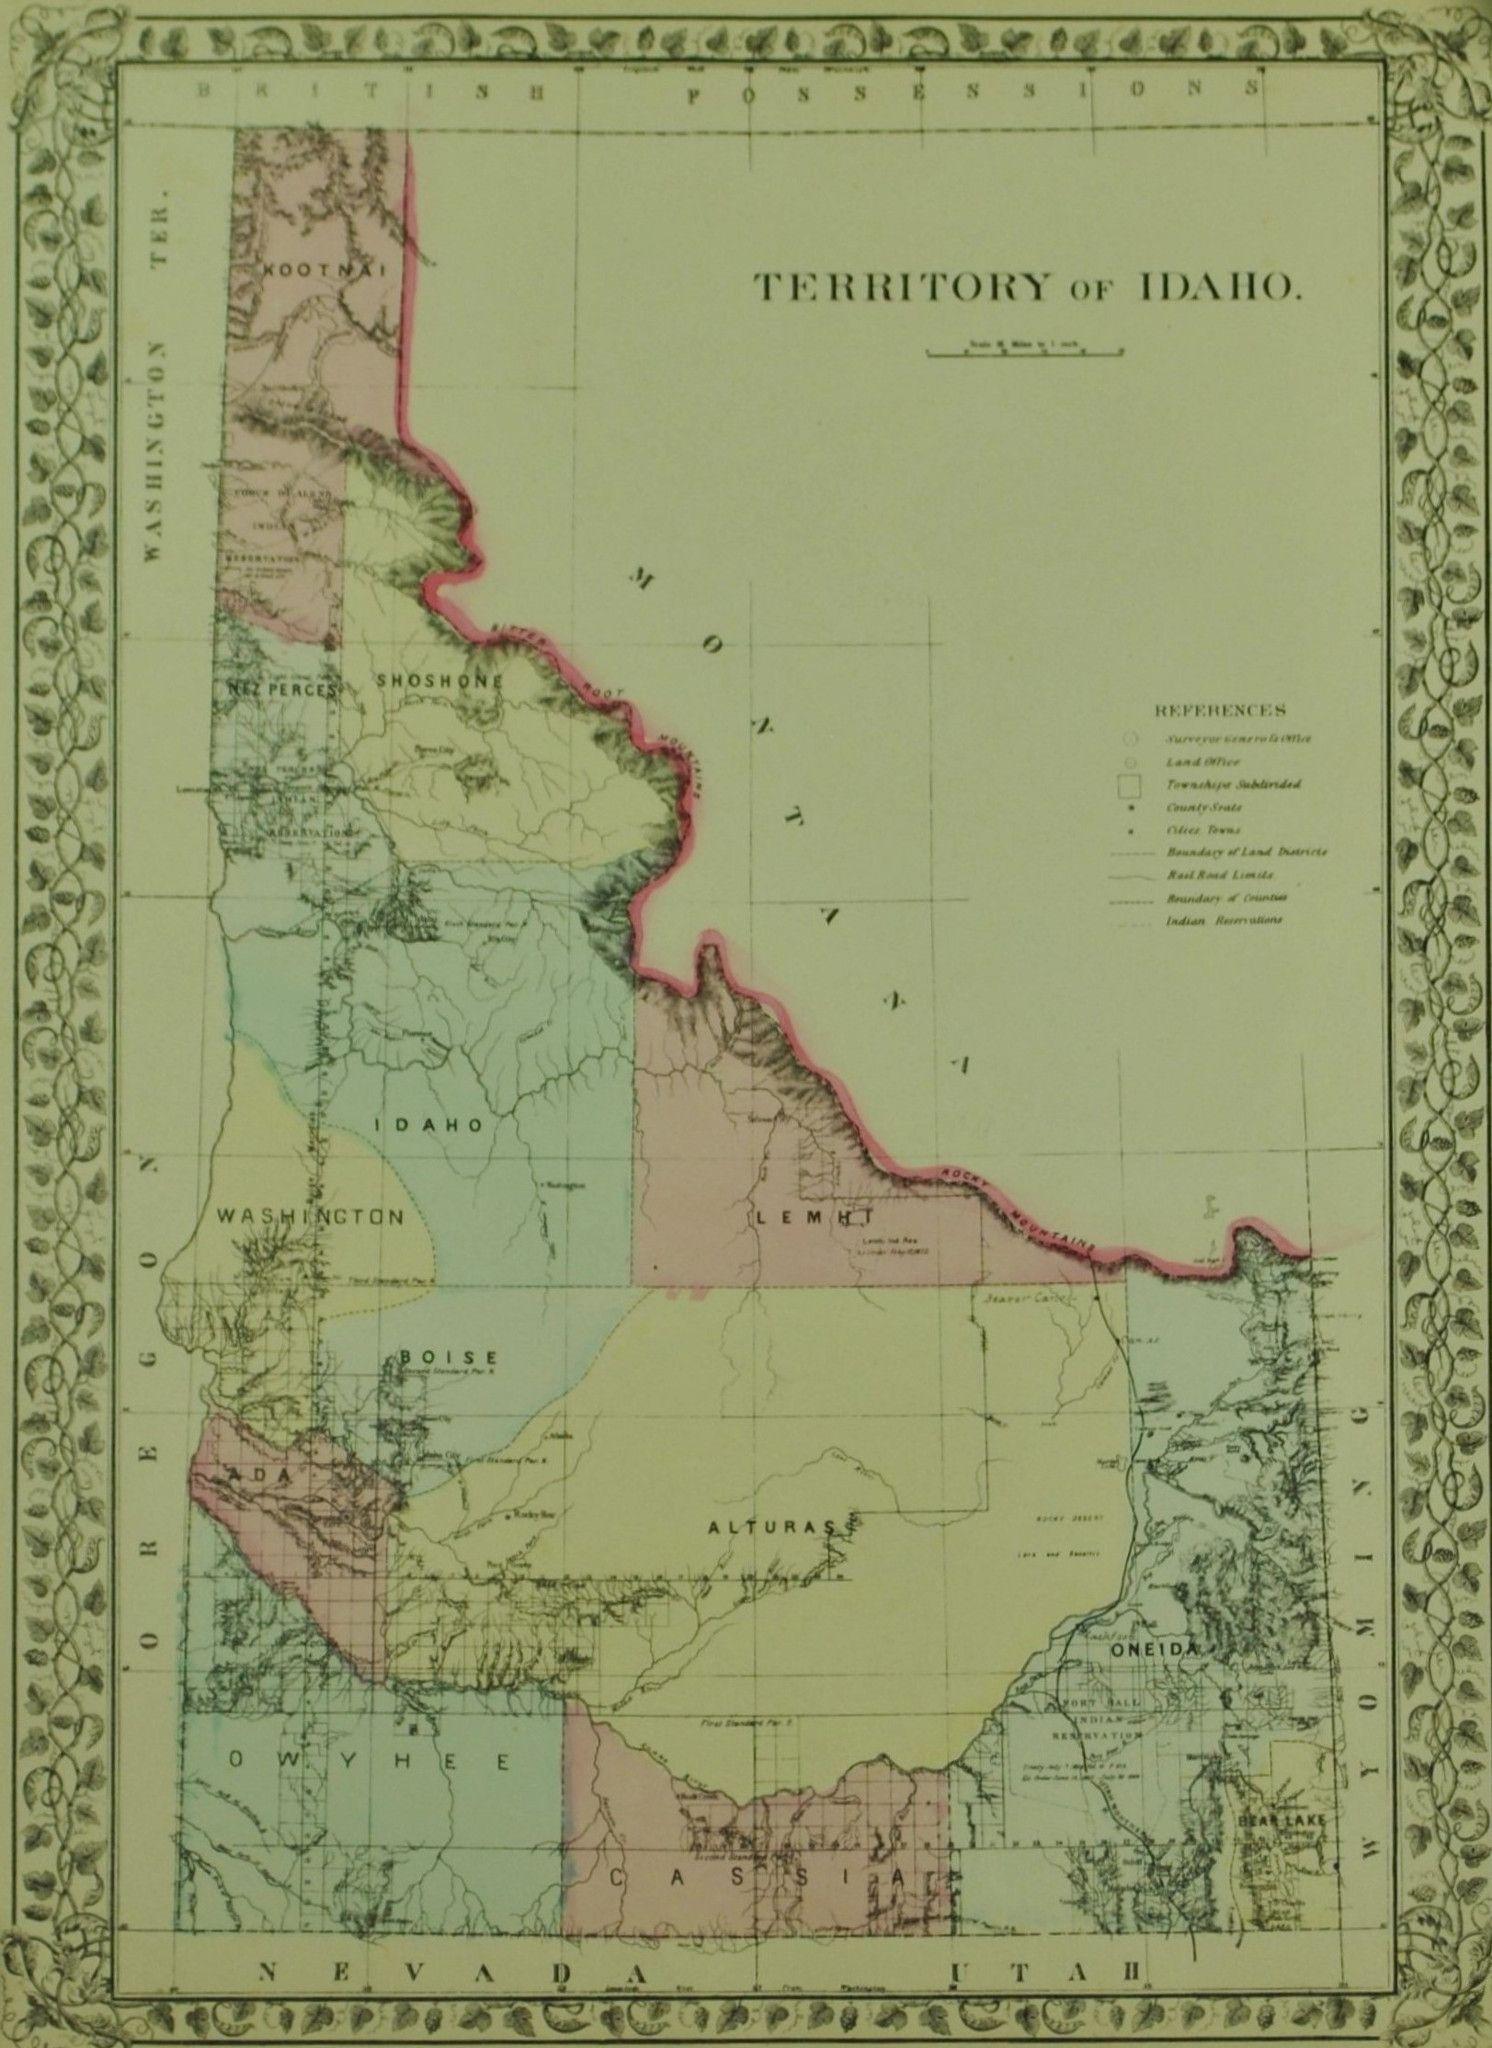 1881 Territory of Idaho - S Mitc Jr   Maps   Map, Idaho, State map on maine's map, california's map, idaho welfare map, oklahoma's map, idaho bureau of land management map, washington's map, saw hills of idaho map, idaho hunters map, idaho campgrounds map, oregon map, idaho farmland map, idaho county map, north idaho map,